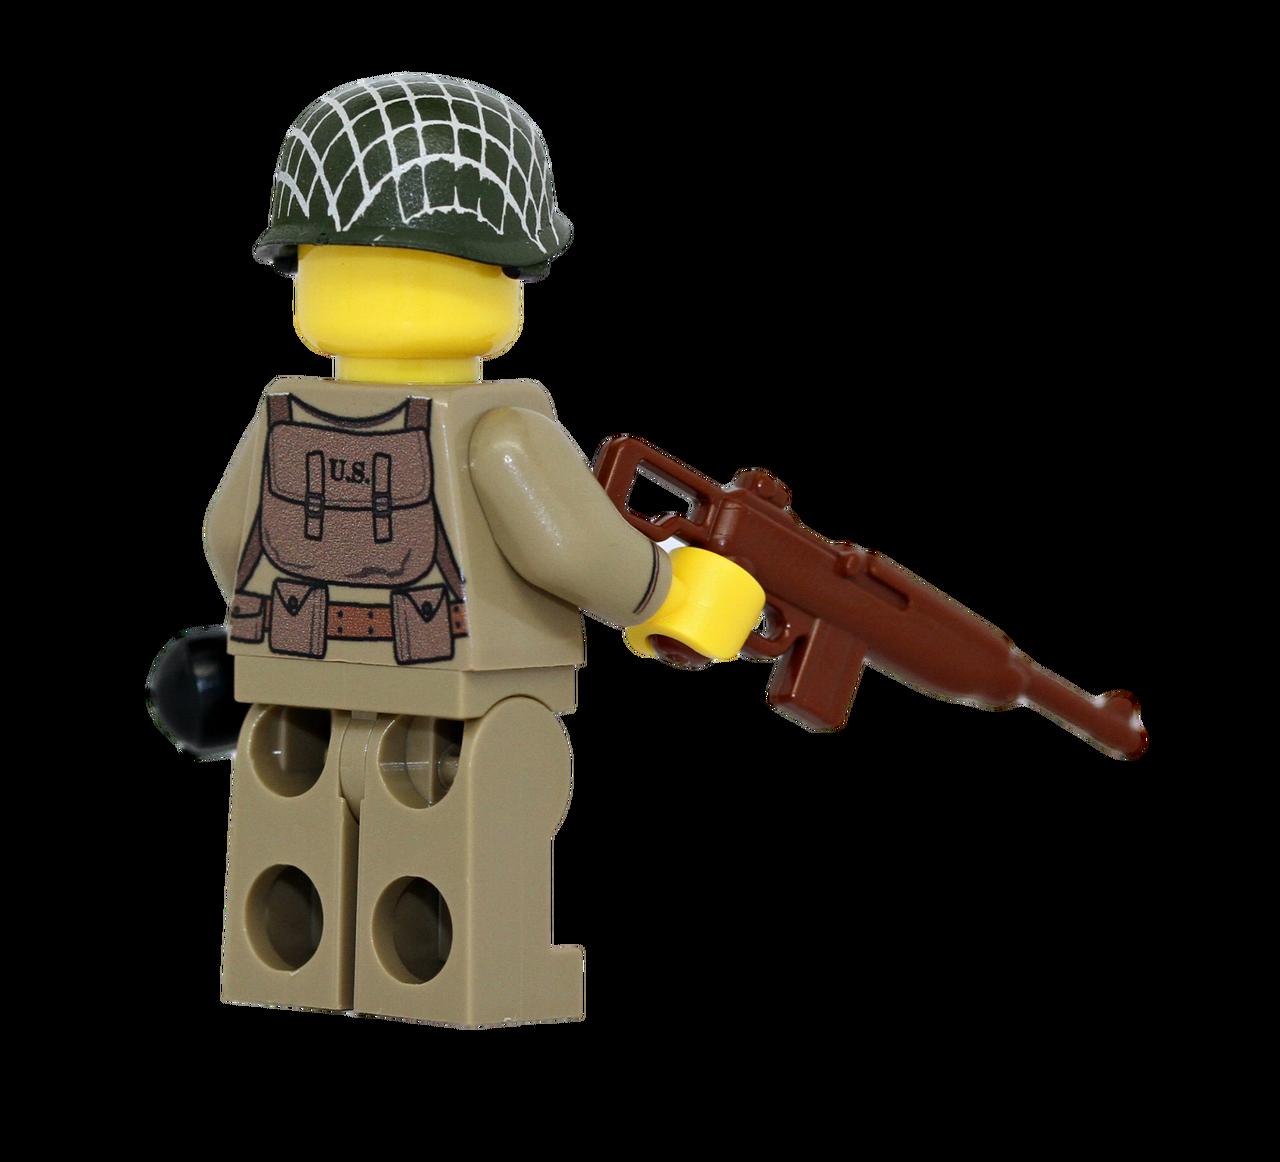 World War 2 US Army 101st Airborne Minifigure